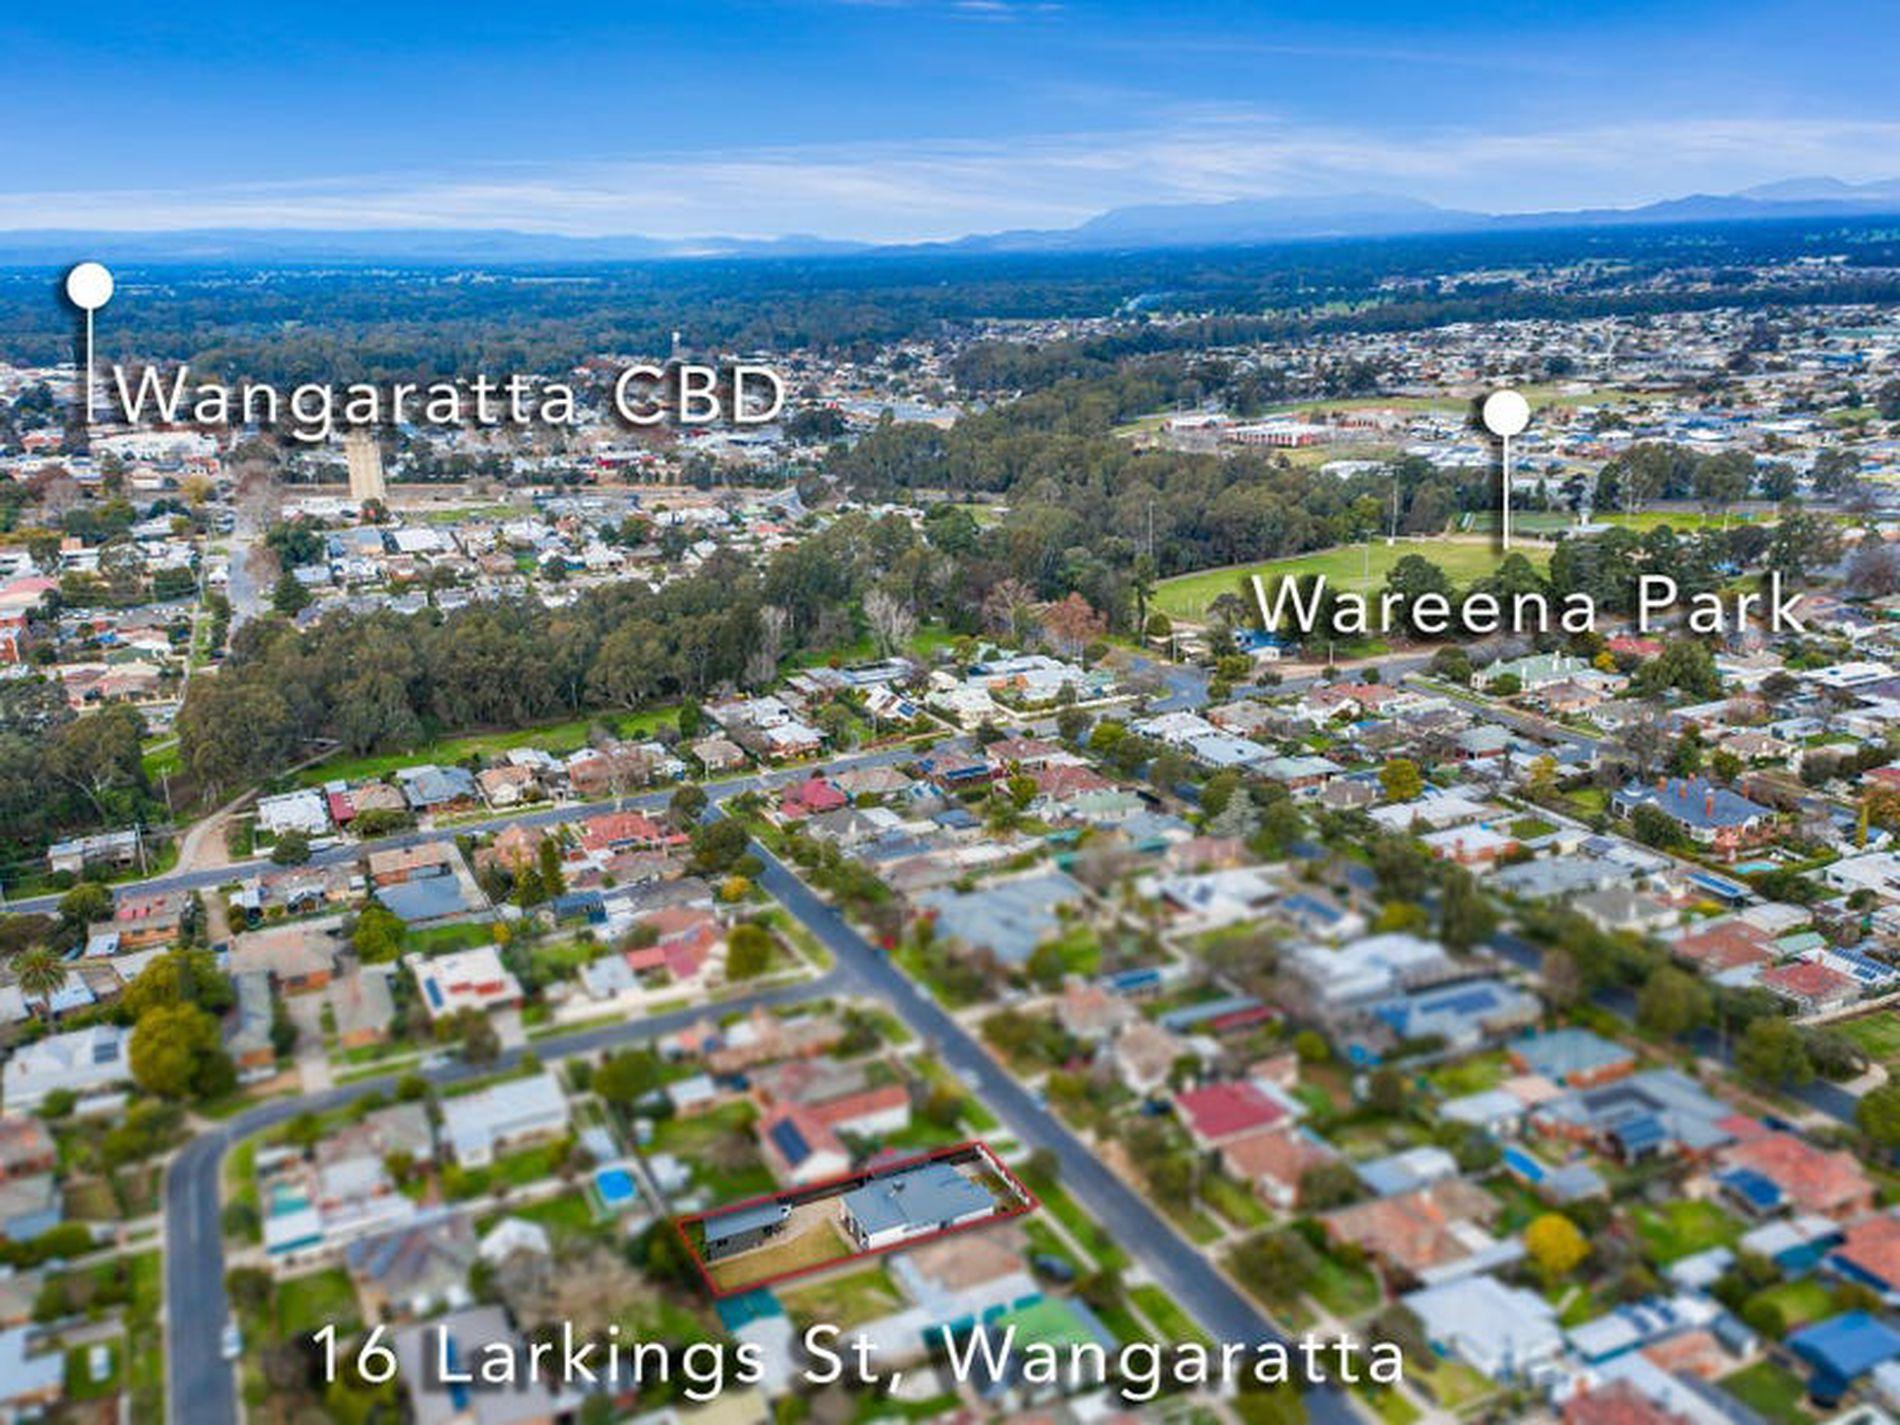 16 Larkings Street, Wangaratta